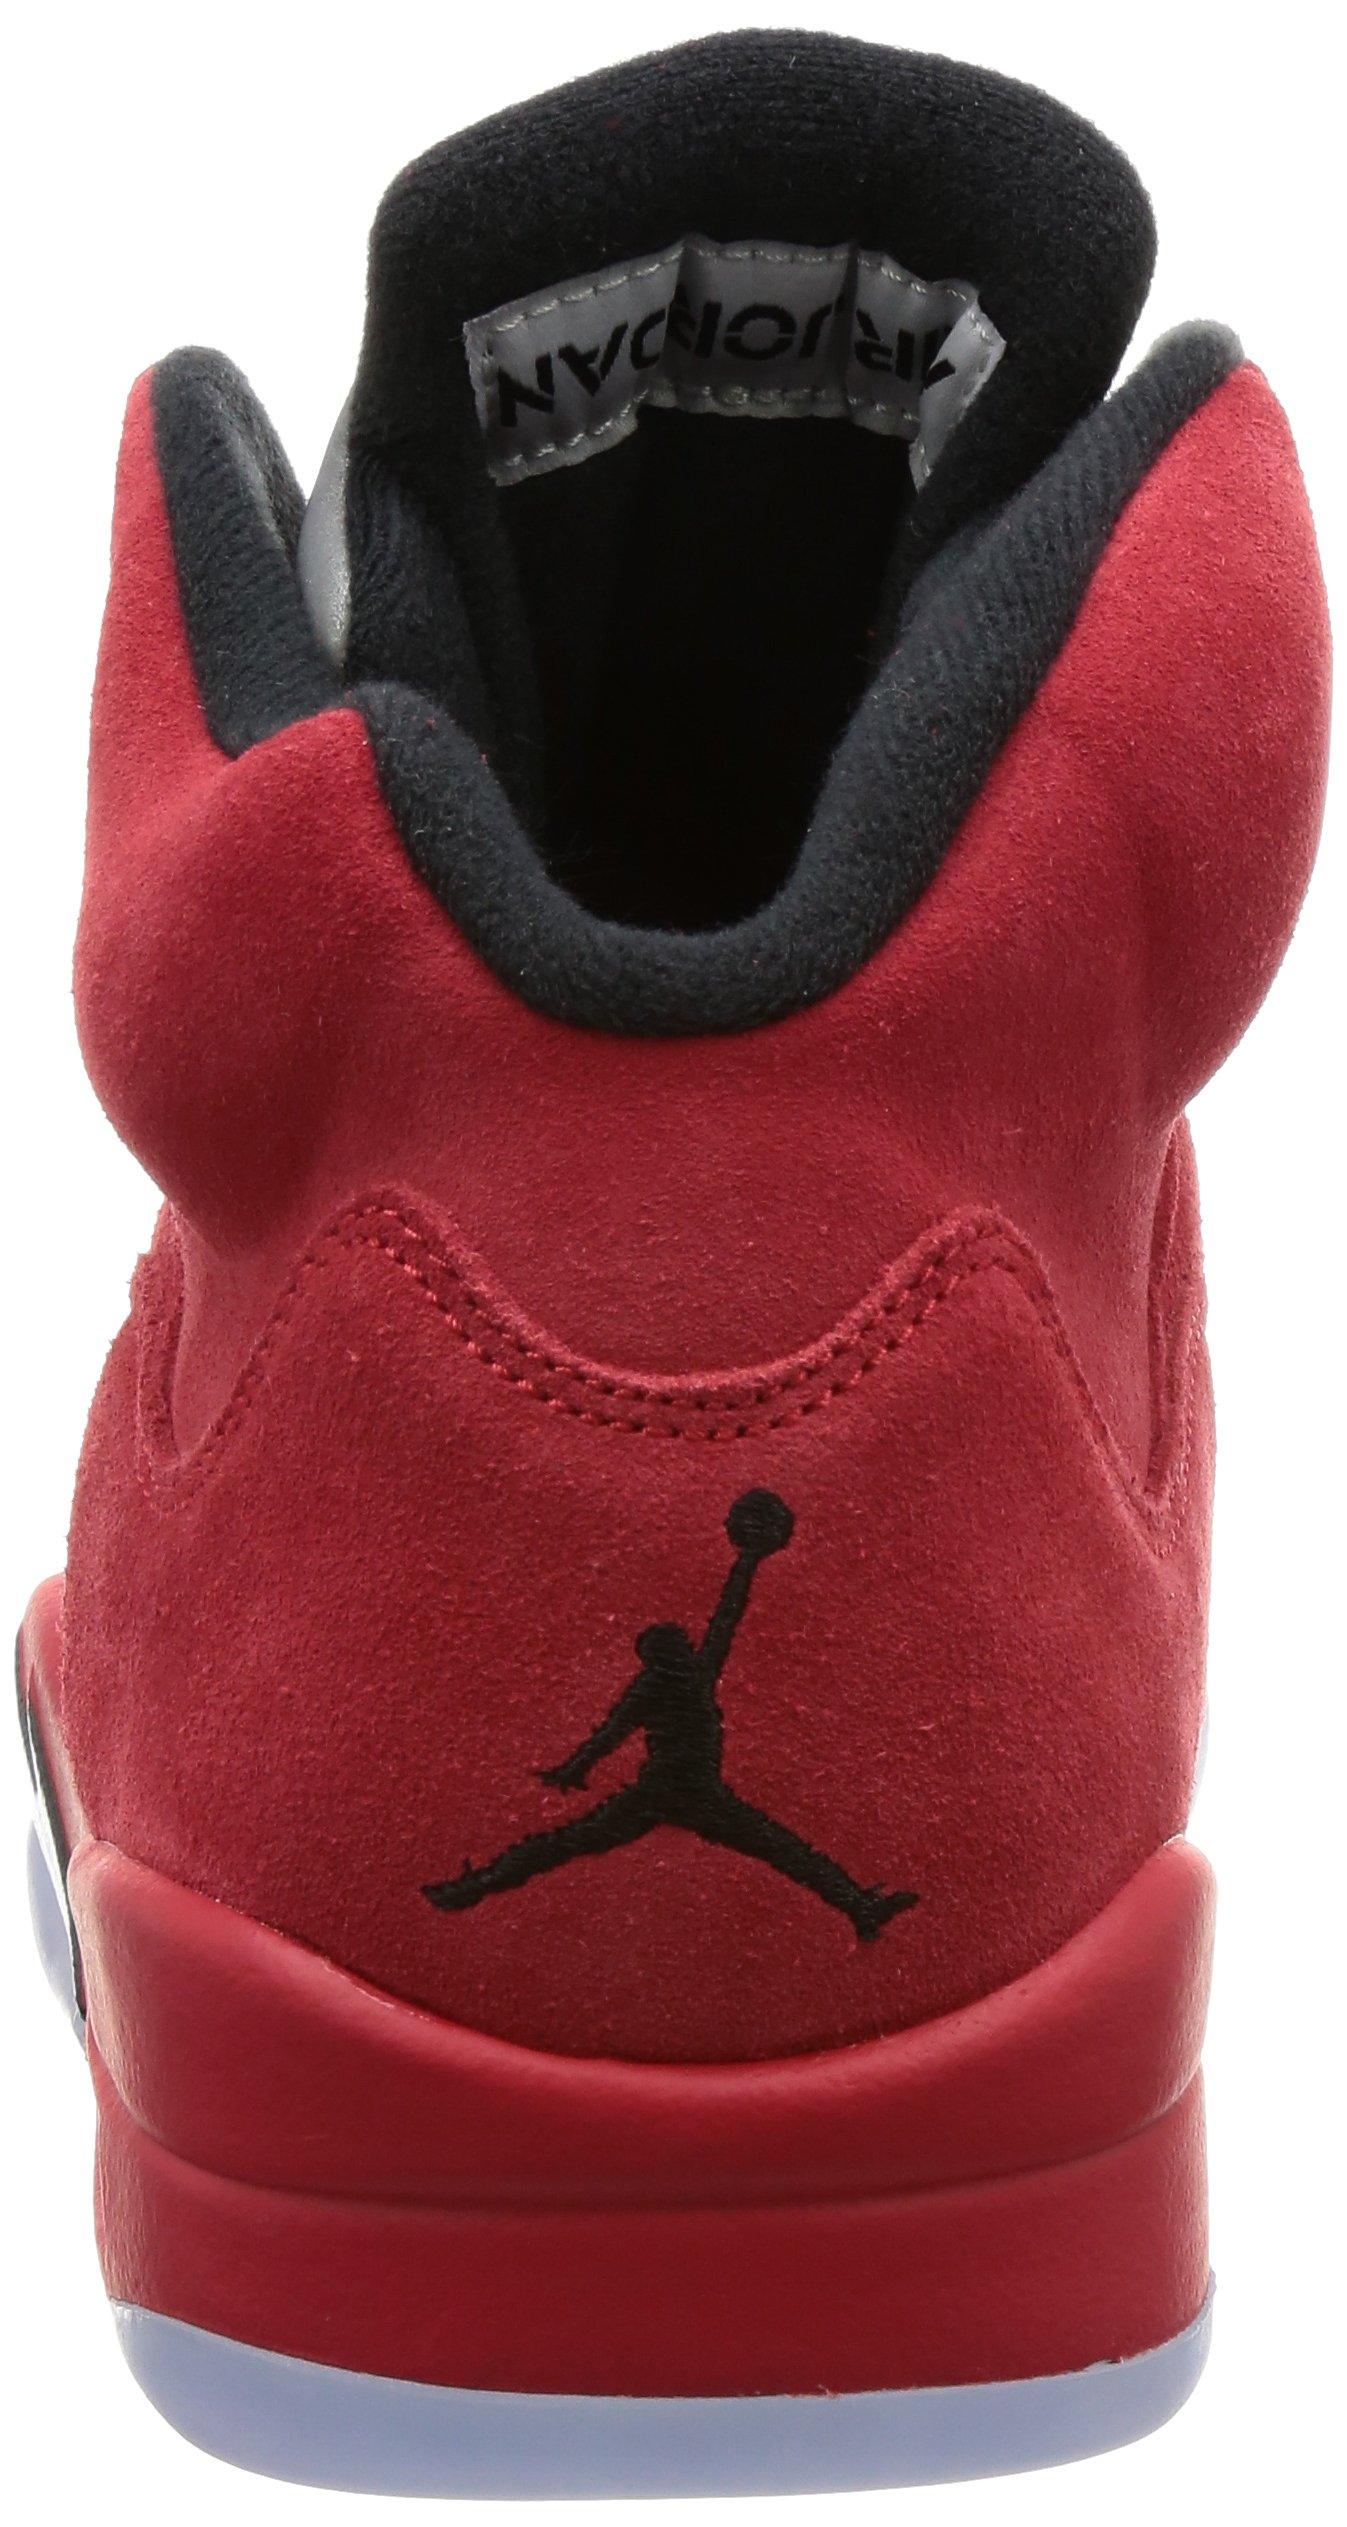 813QfkQ4eLL - Nike Air Jordan 5 Retro 'Red Suede' - 136027-602 - Size 9 -